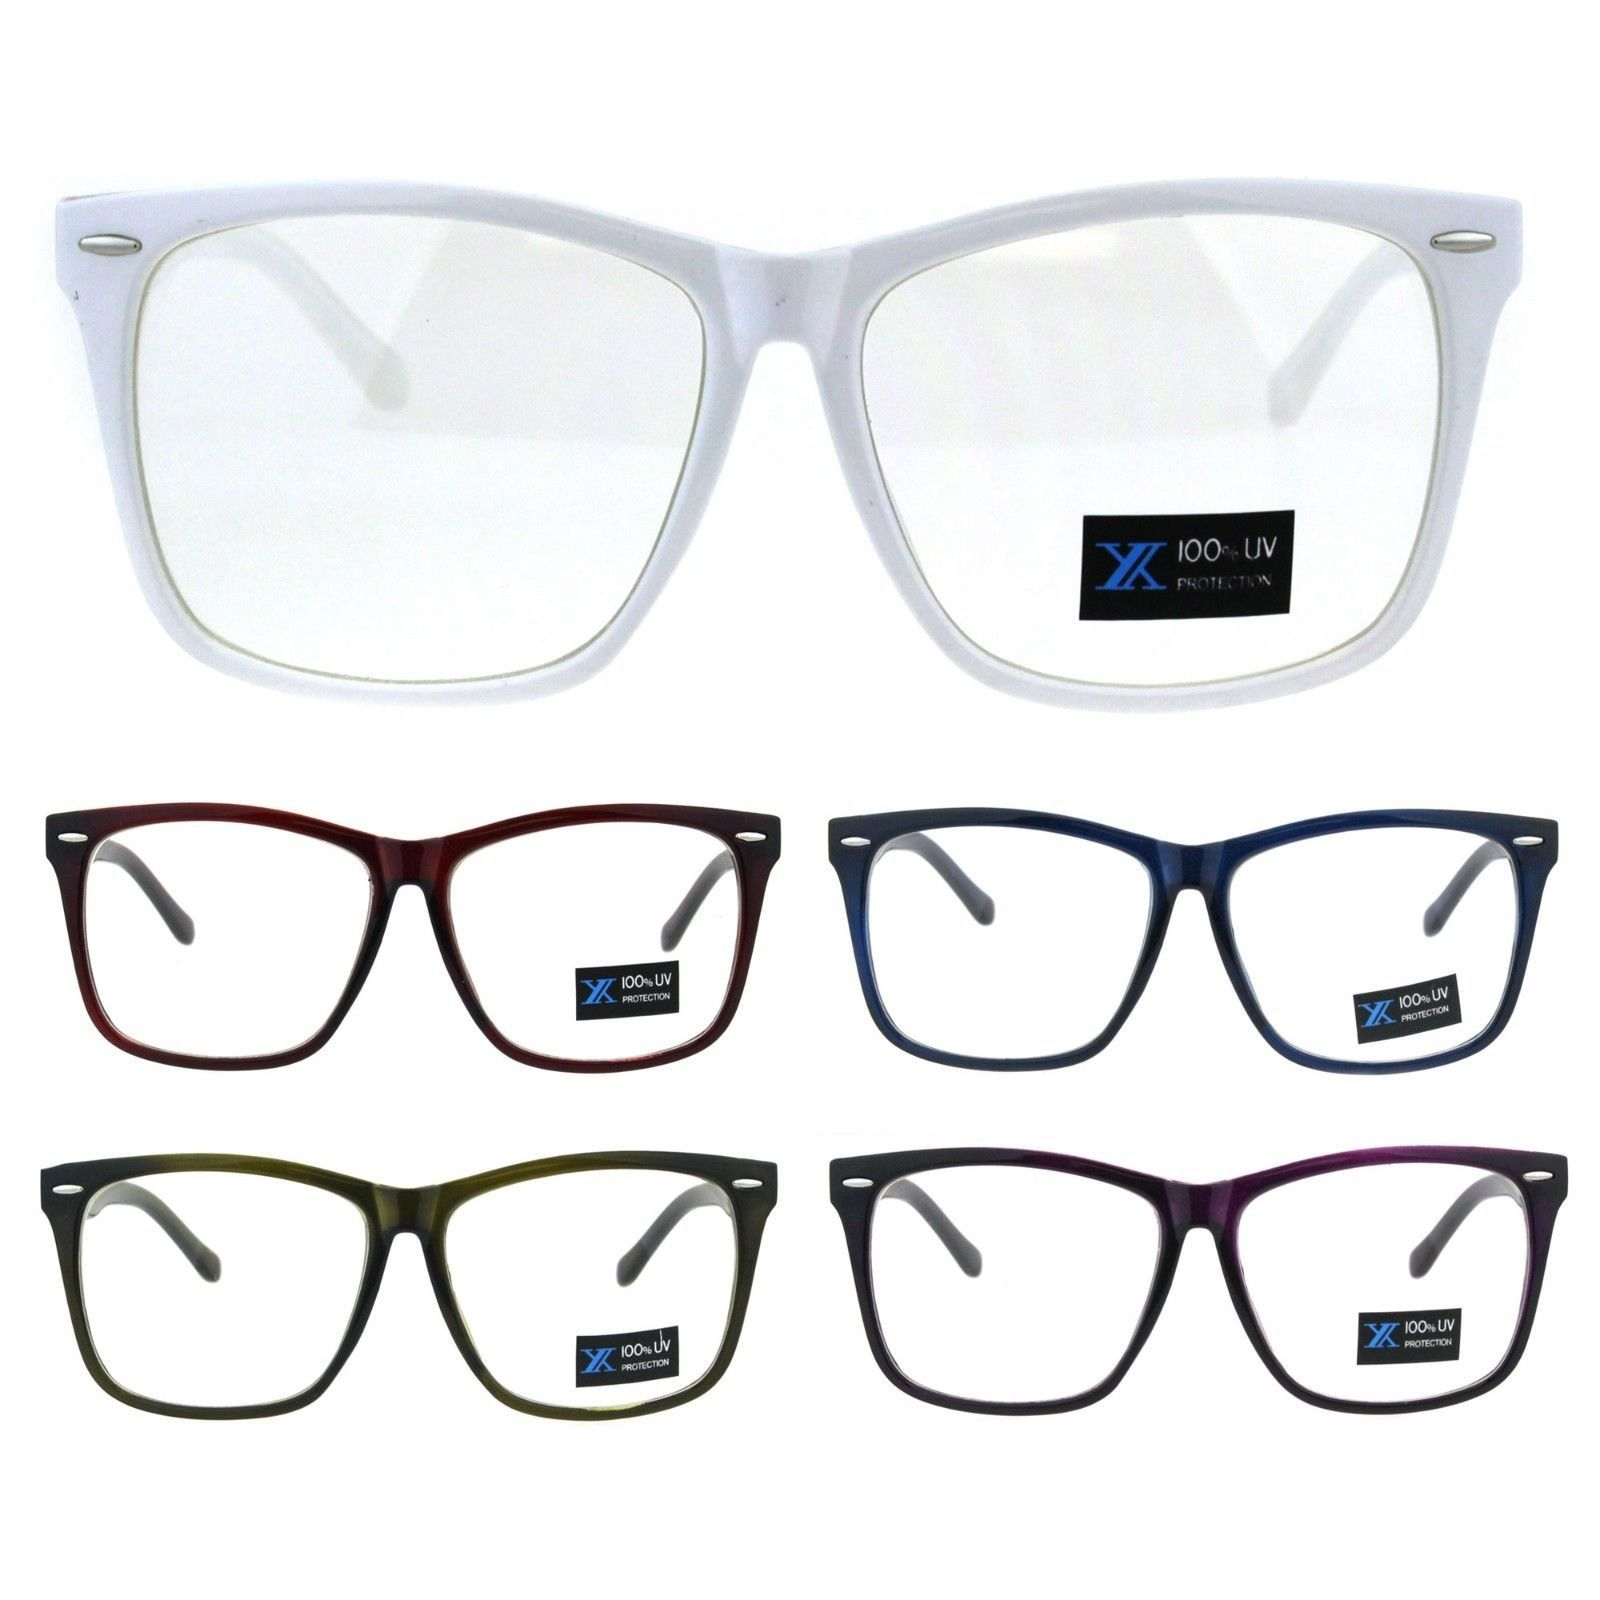 24a9091c83 57. 57. Thin Plastic Nerdy Geek Rectangular Clear Lens Eyeglasses